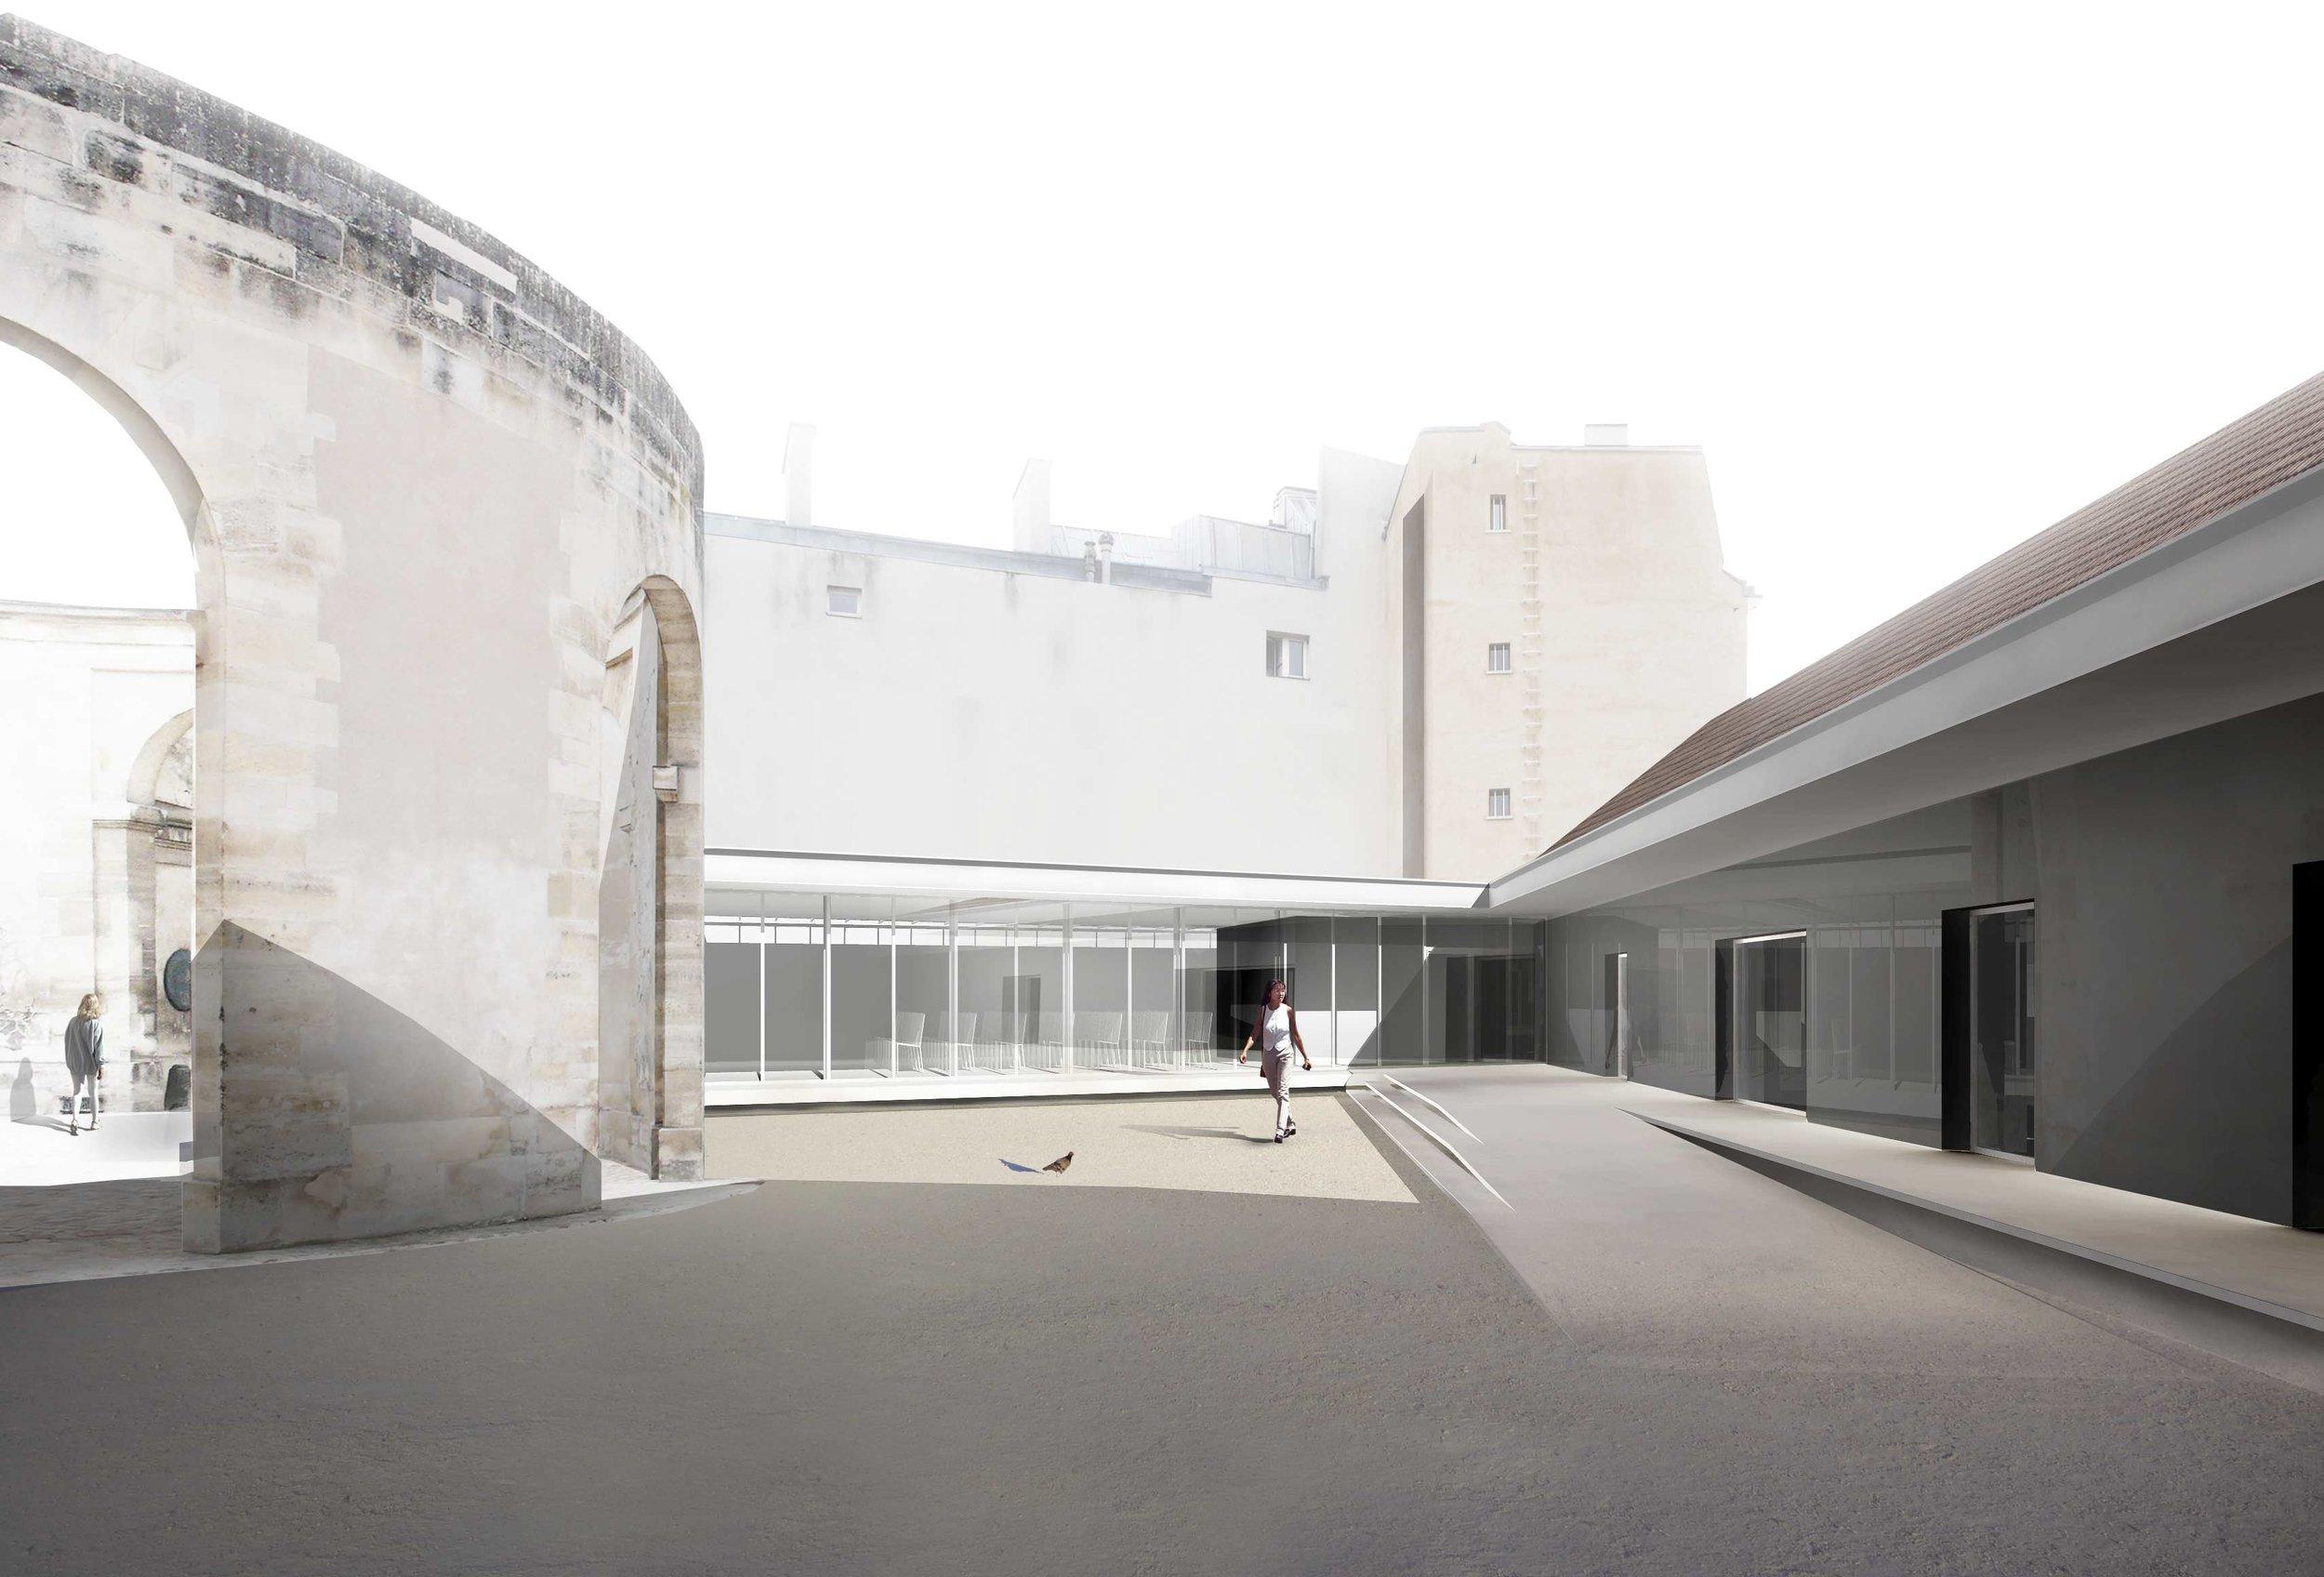 Versailles-caserne-Perspective-02.jpg